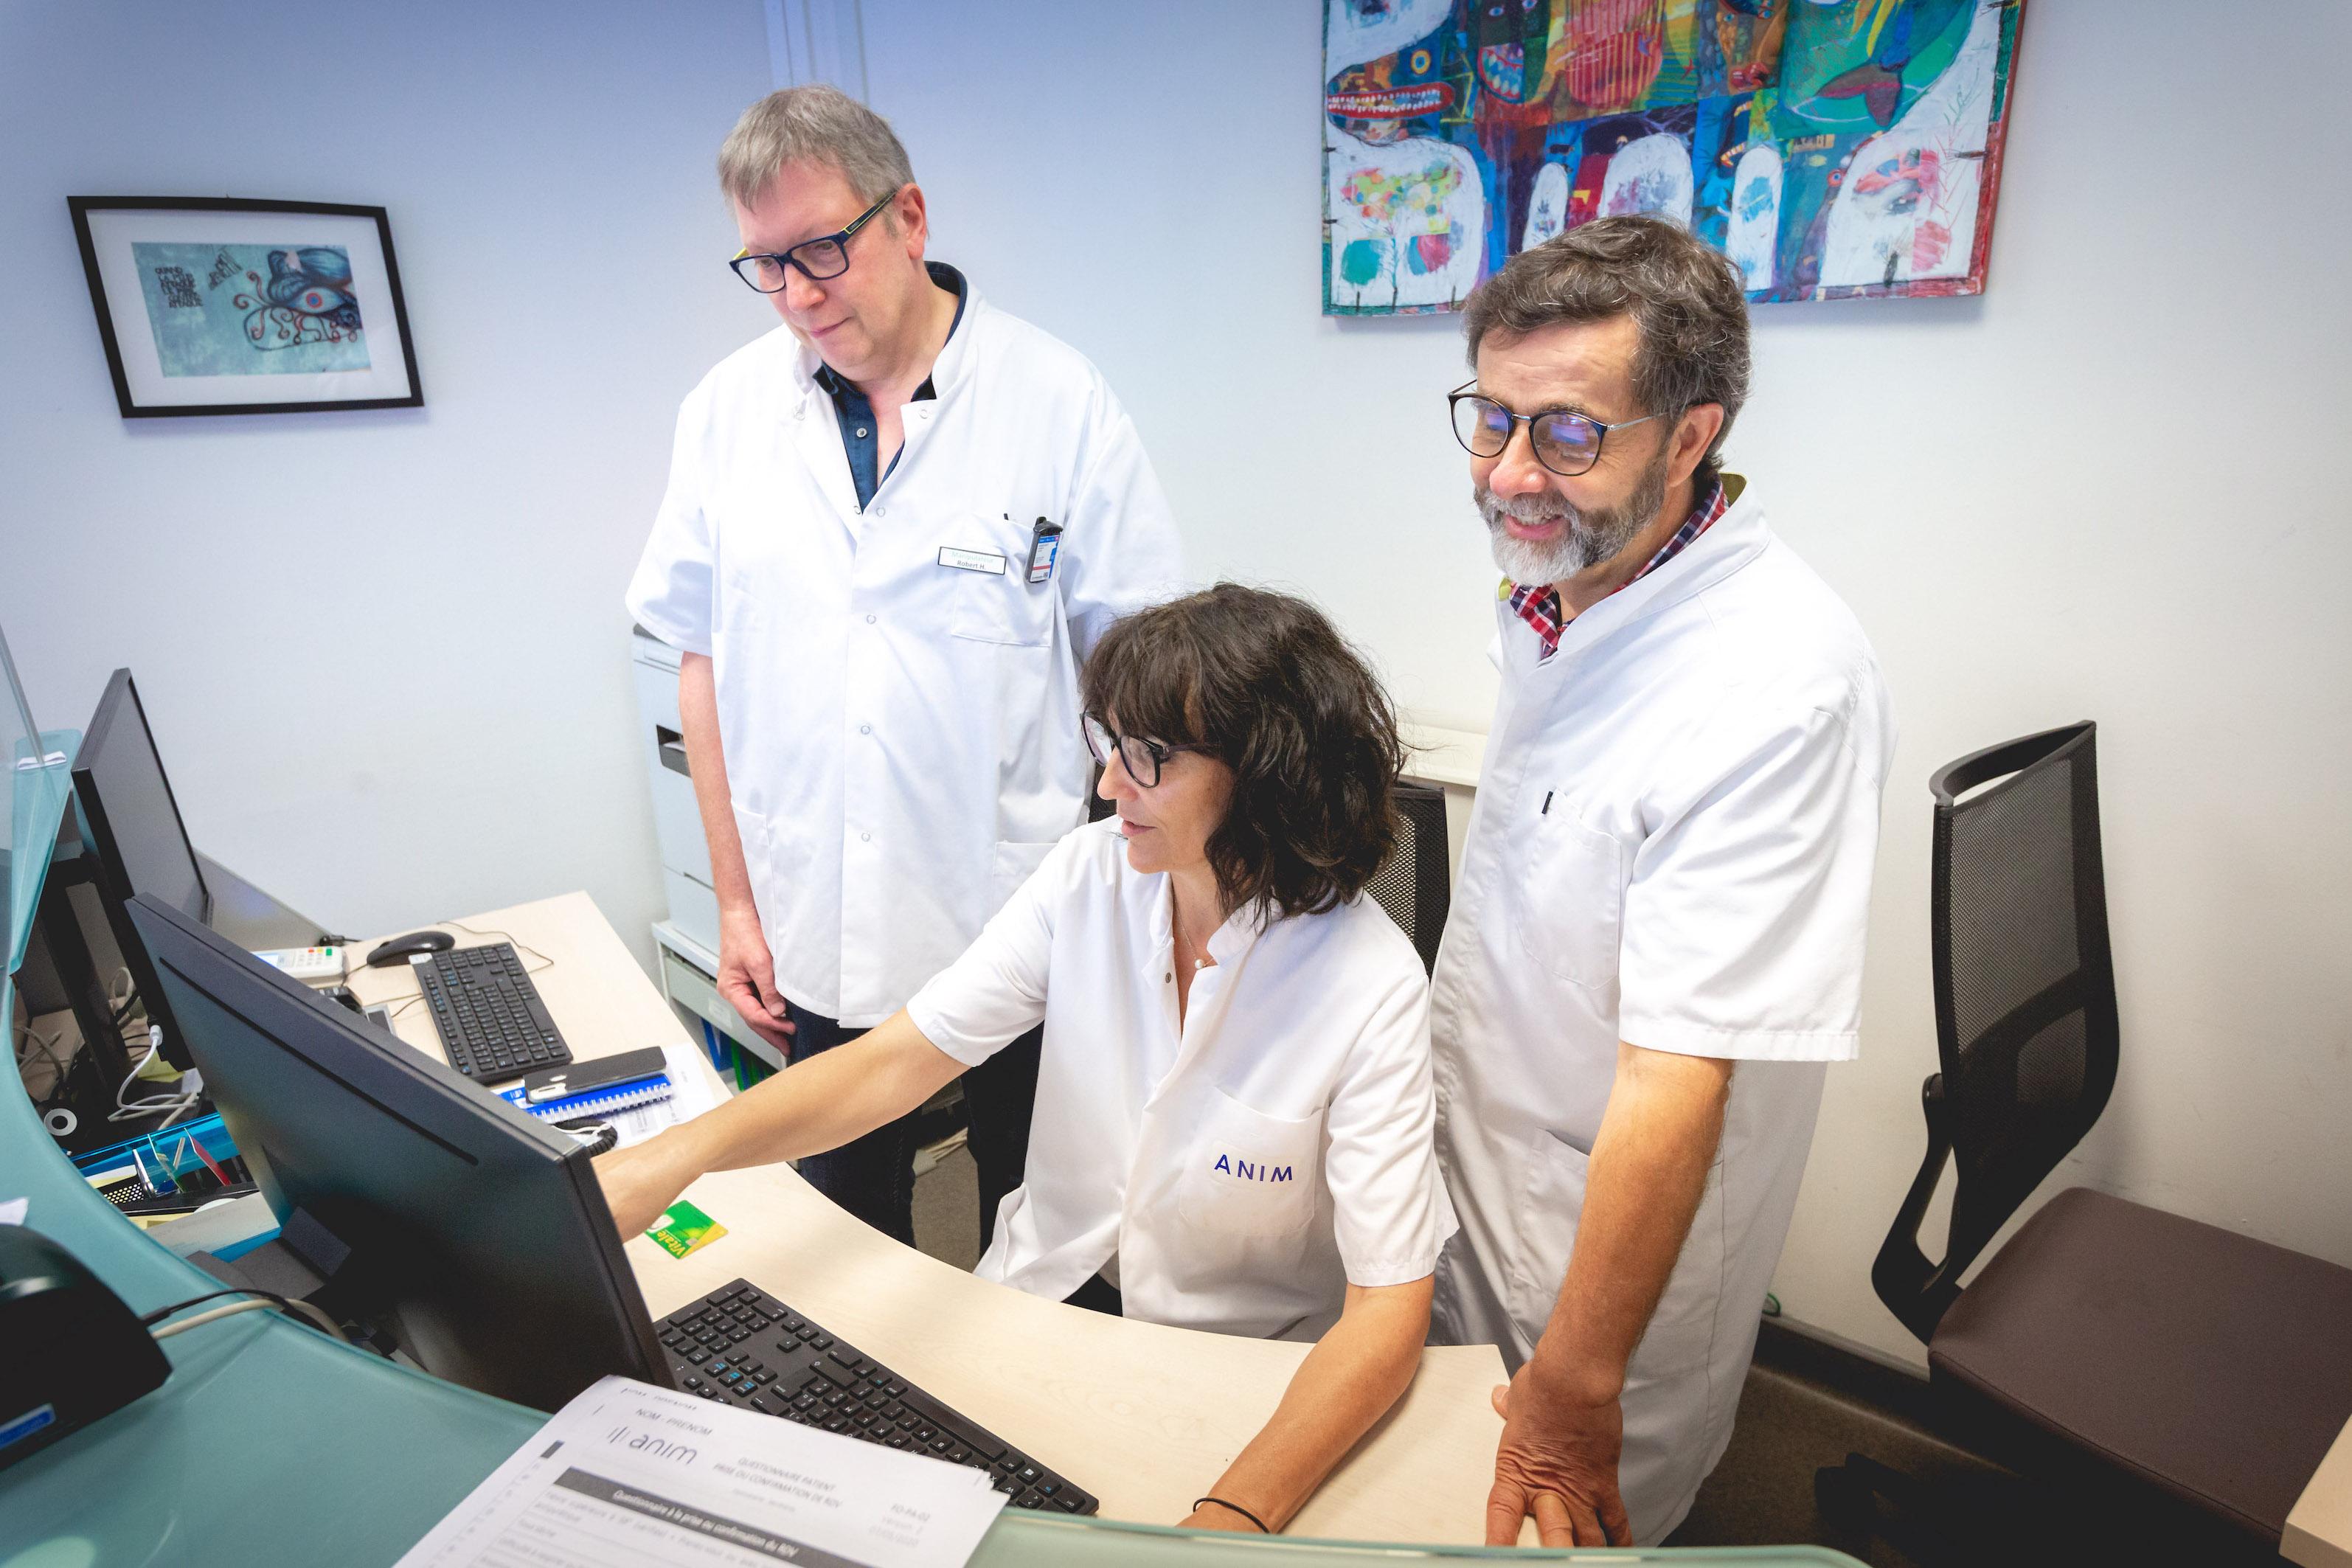 cabinet radiologie uzes